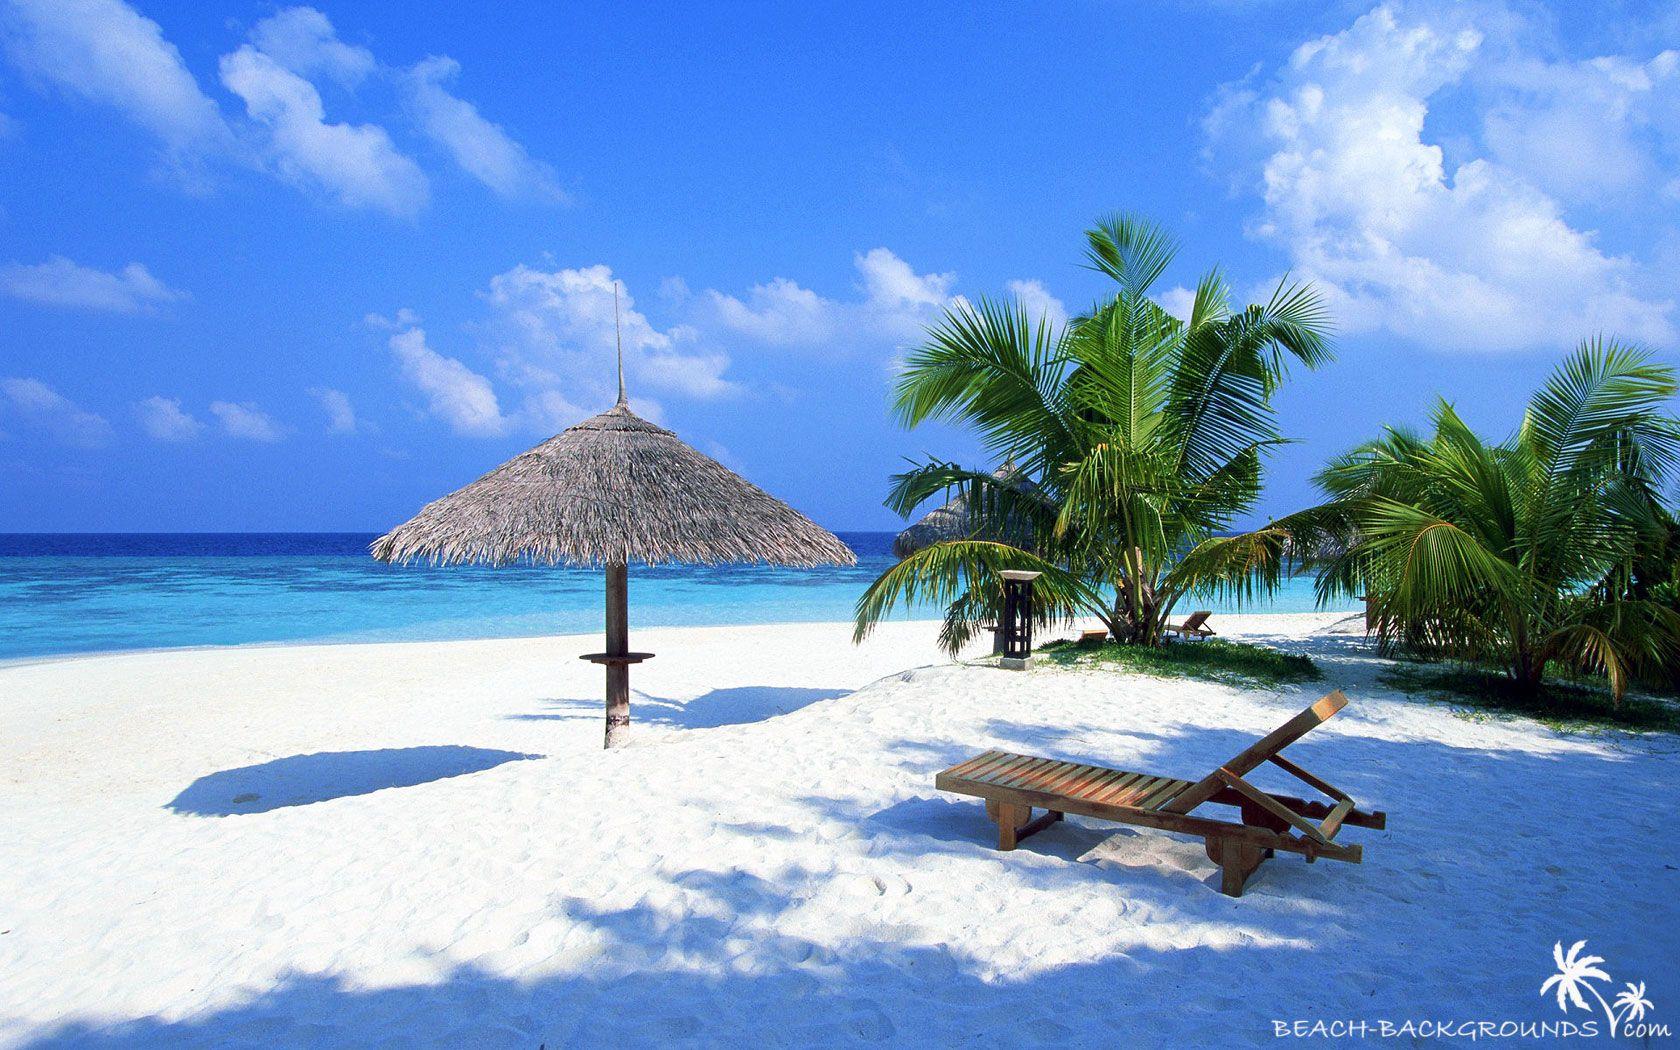 Wallpapers Thai Beach Free Hot Pants Screensaver 1680x1050 Beach Wallpaper Beautiful Beaches Beaches In The World